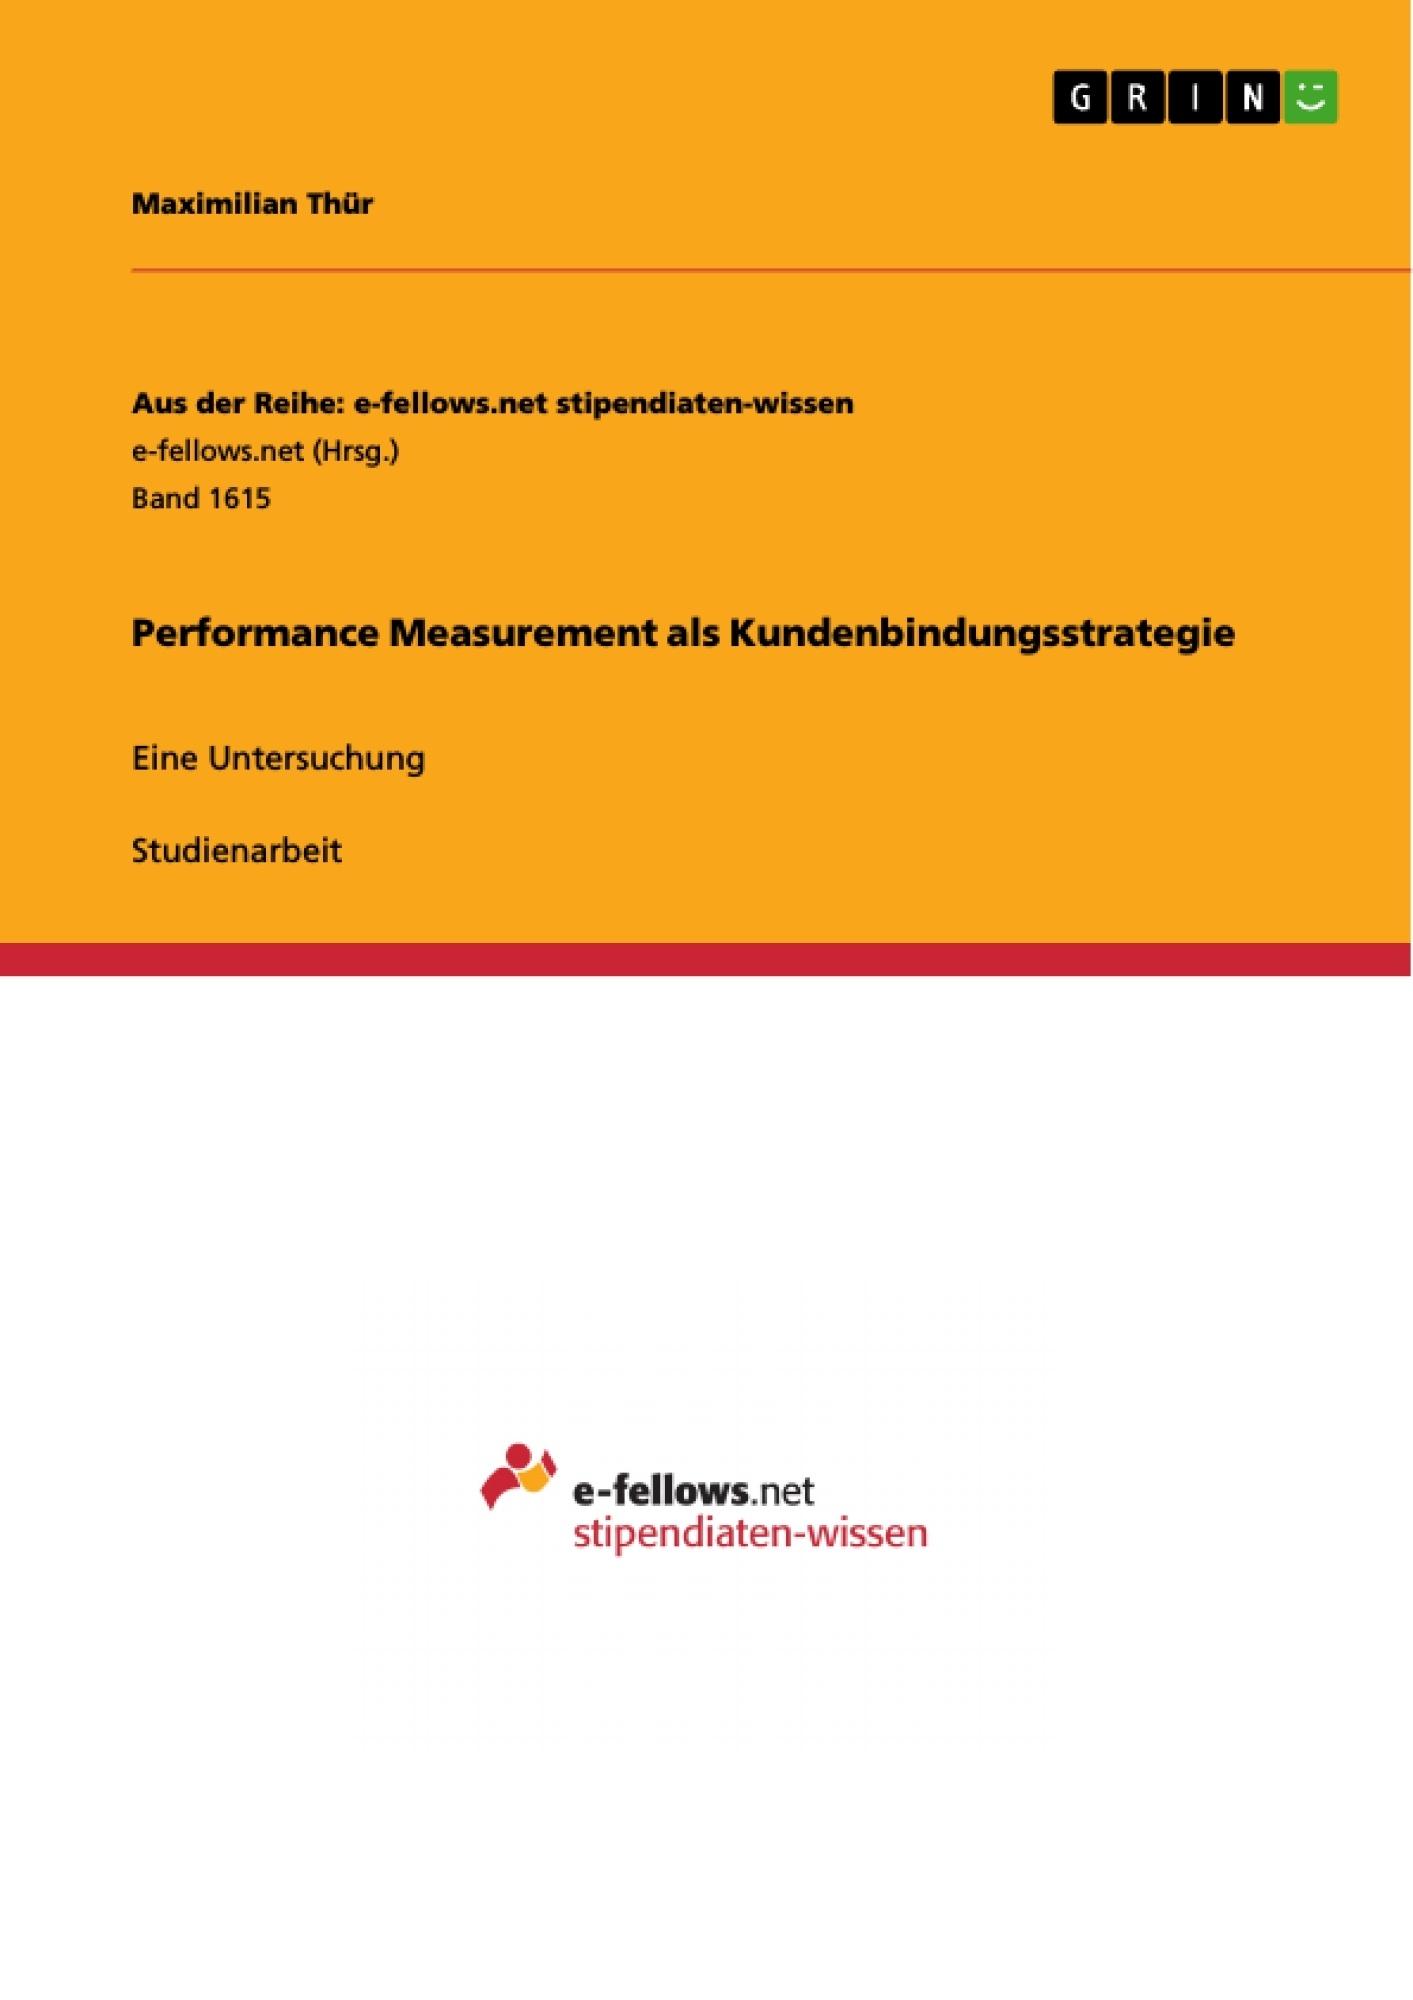 Titel: Performance Measurement als Kundenbindungsstrategie